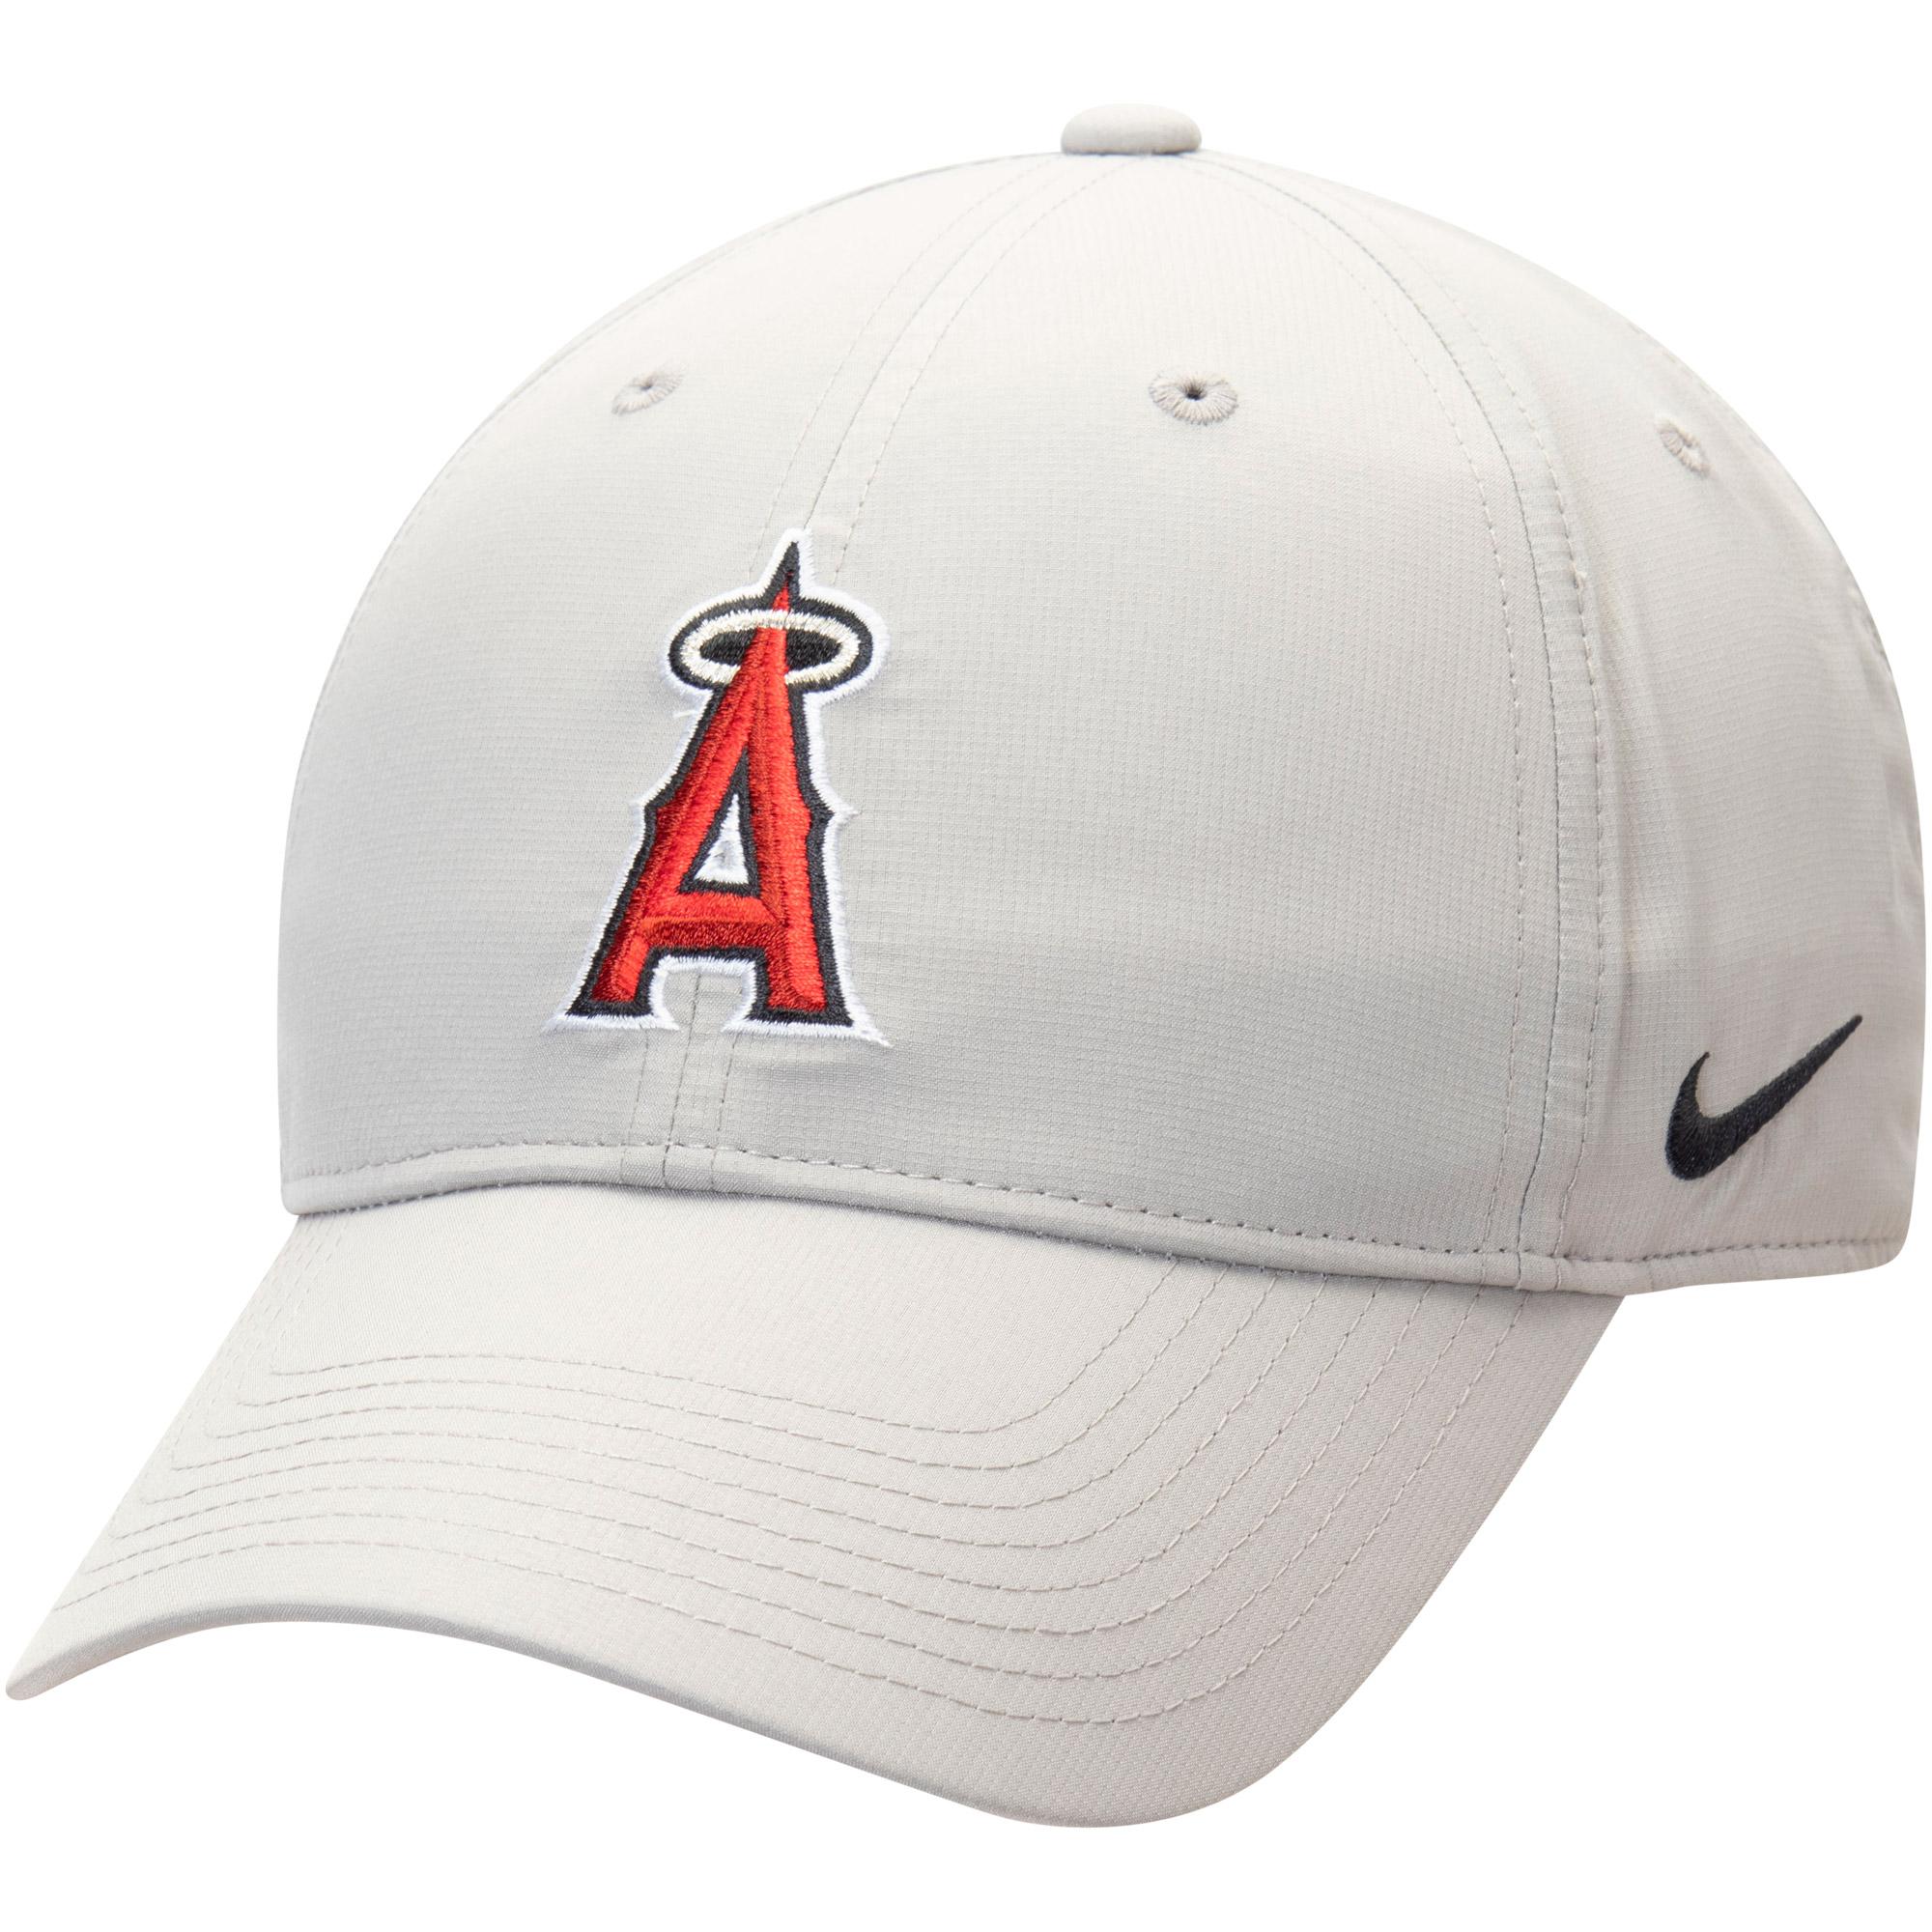 Los Angeles Angels Nike Legacy 91 Adjustable Performance Hat - Gray - OSFA